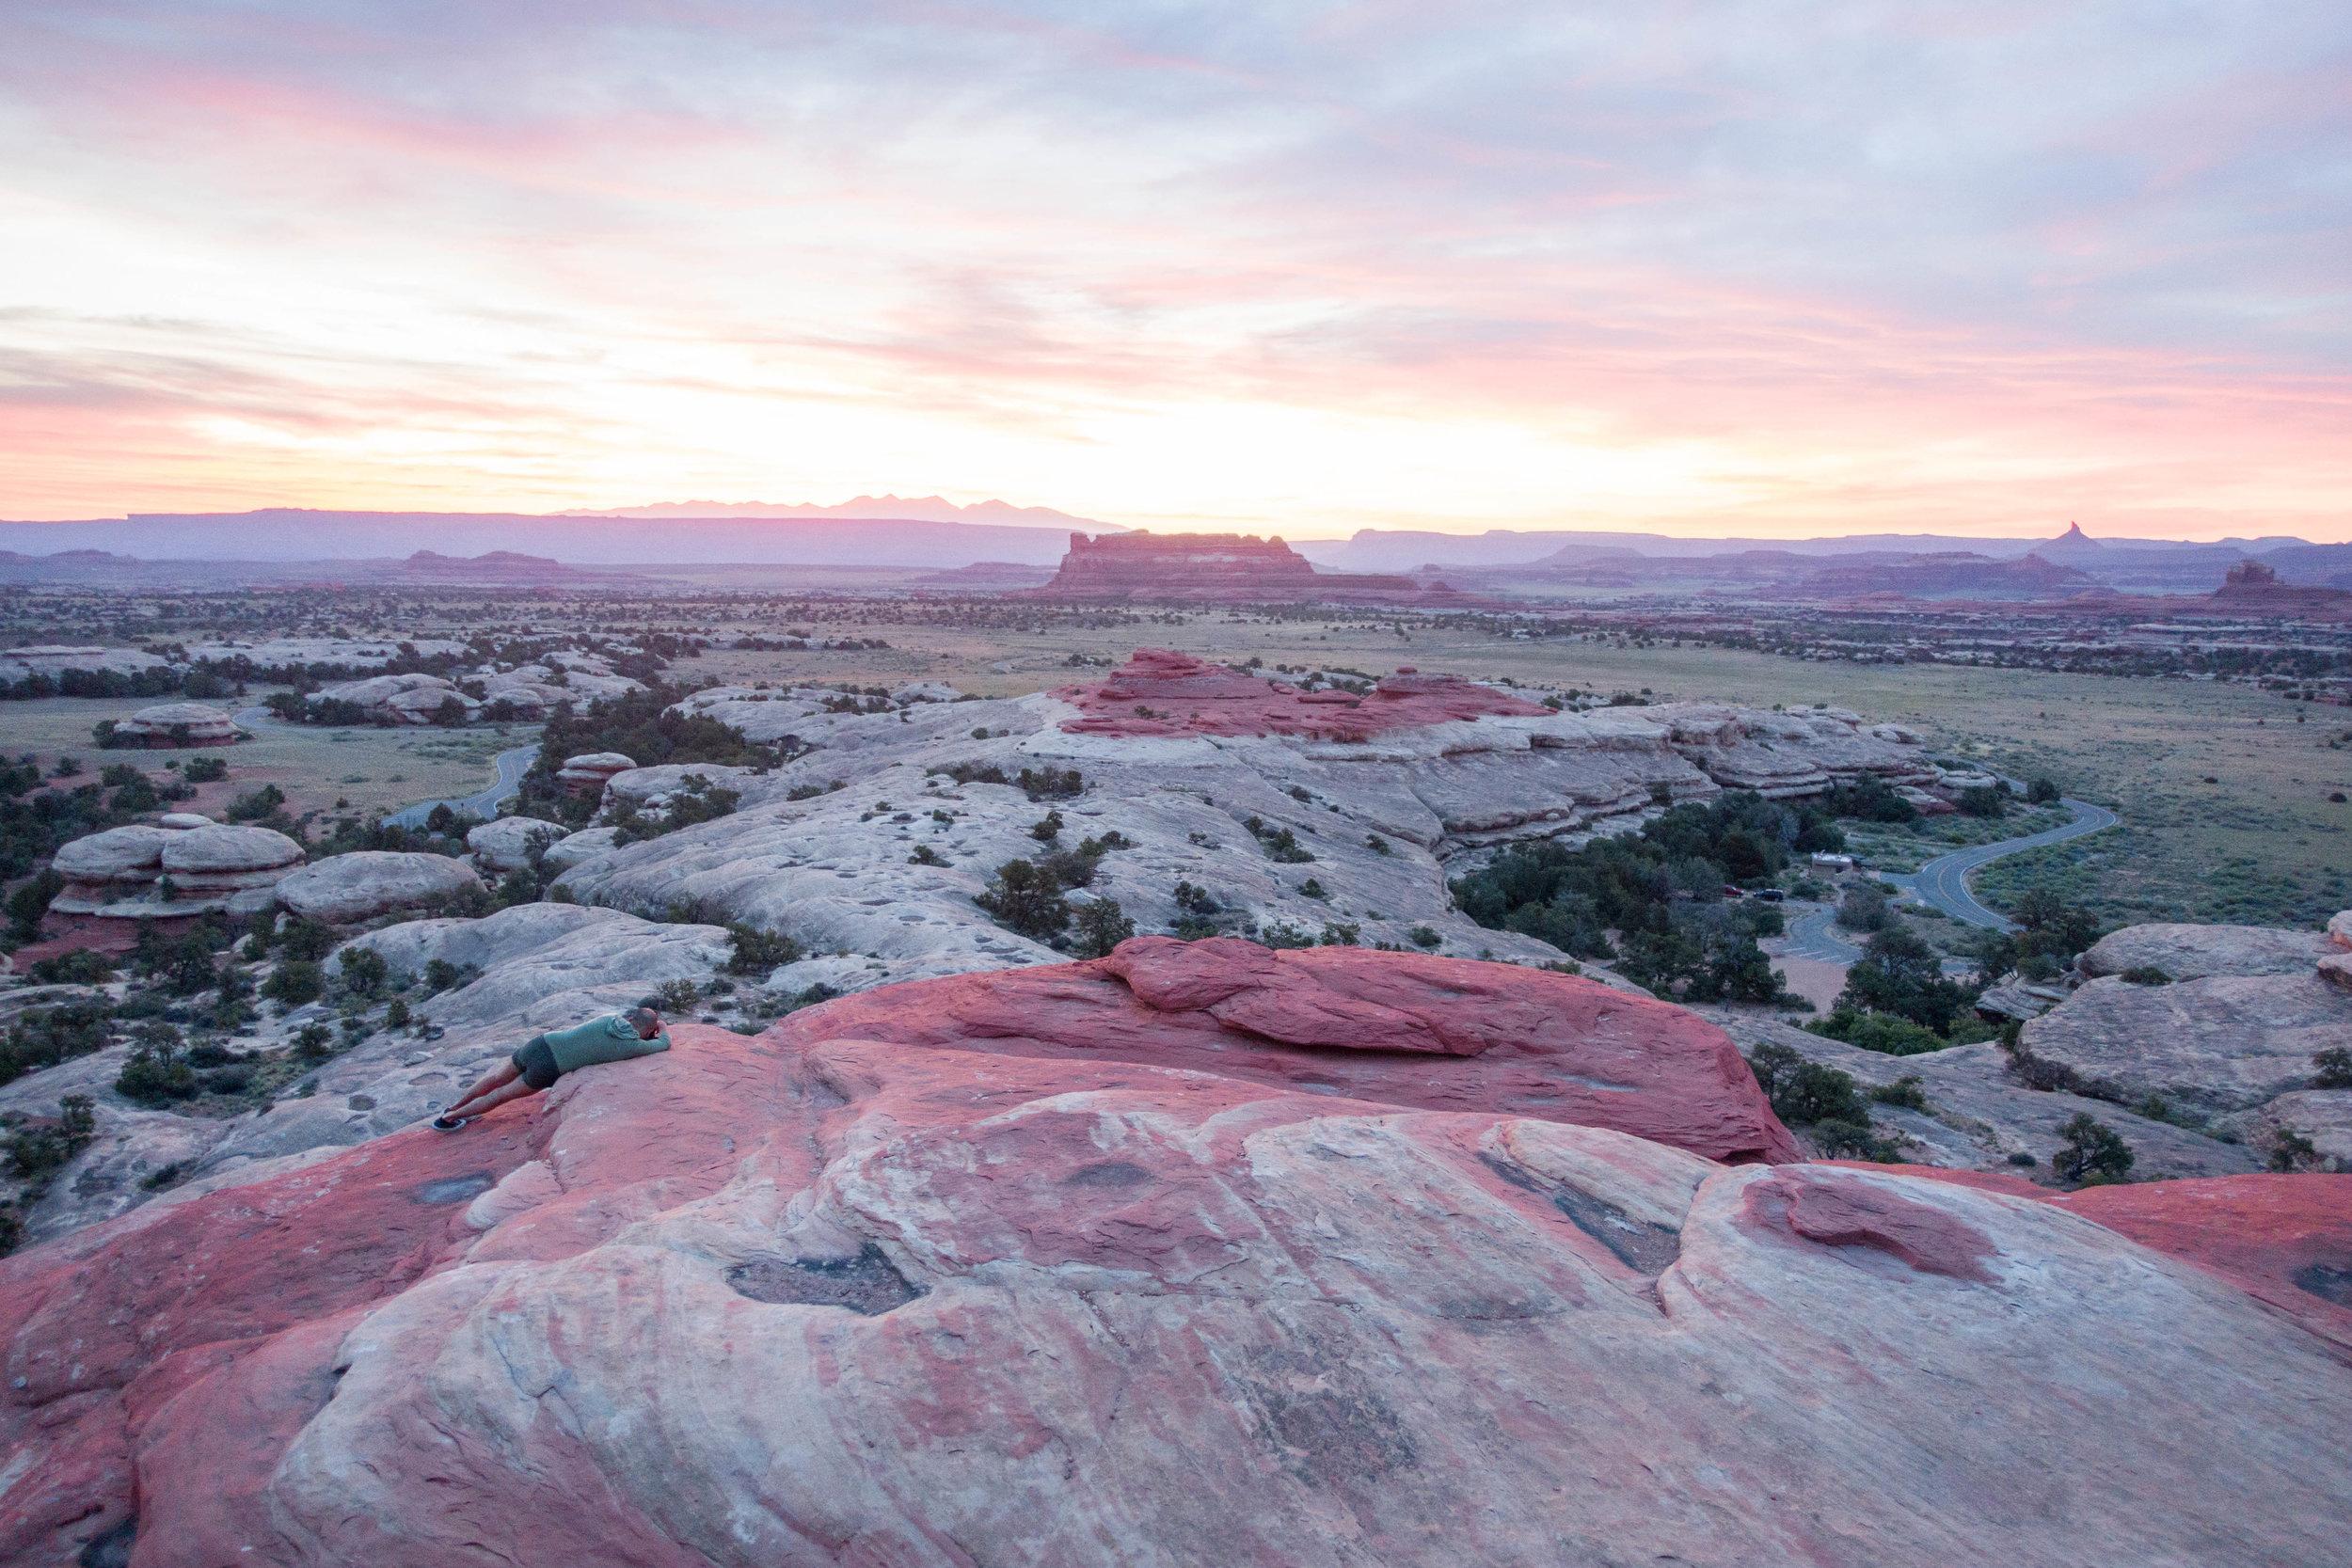 Canyonlands National Park (Needles District), Utah. Shot on DSLR (Nikon D7000).